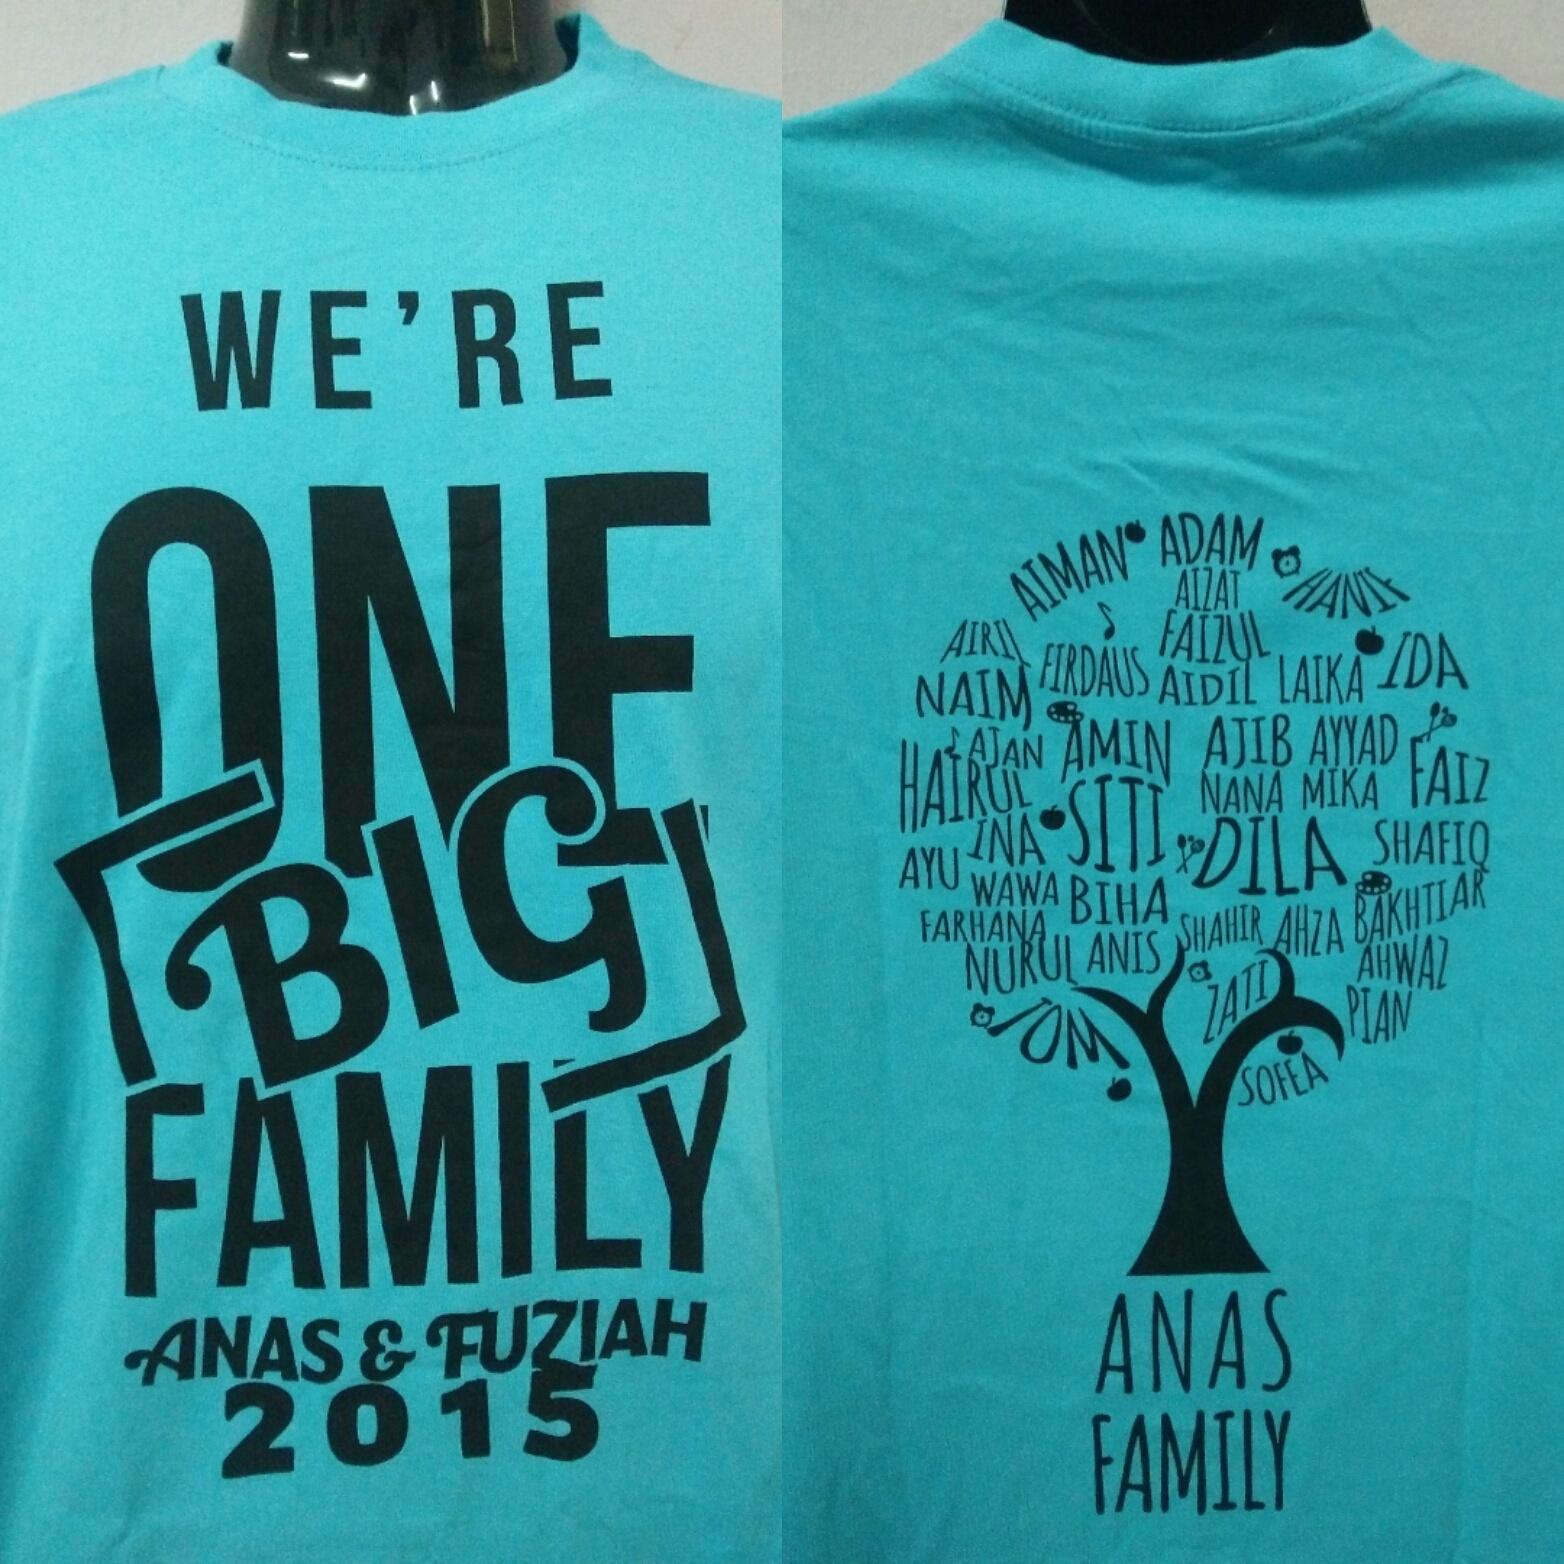 Contoh design t shirt family day - Design T Shirt Keluarga Design T Shirt Untuk Family Day Design T Shirt Keluarga Dicatat